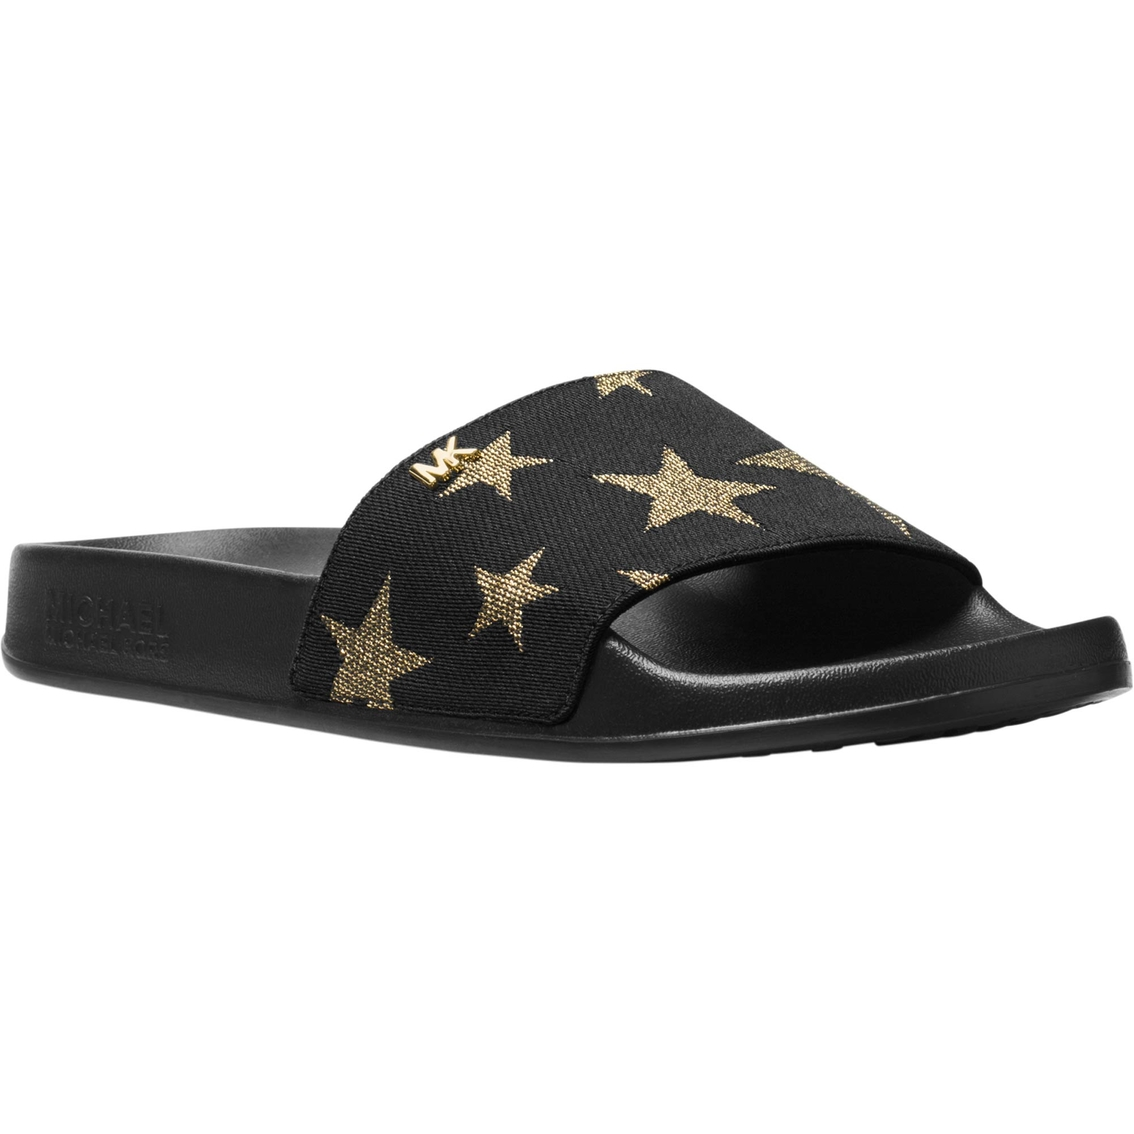 dcc8d26065b8 Michael Kors Sia Slide Sandals